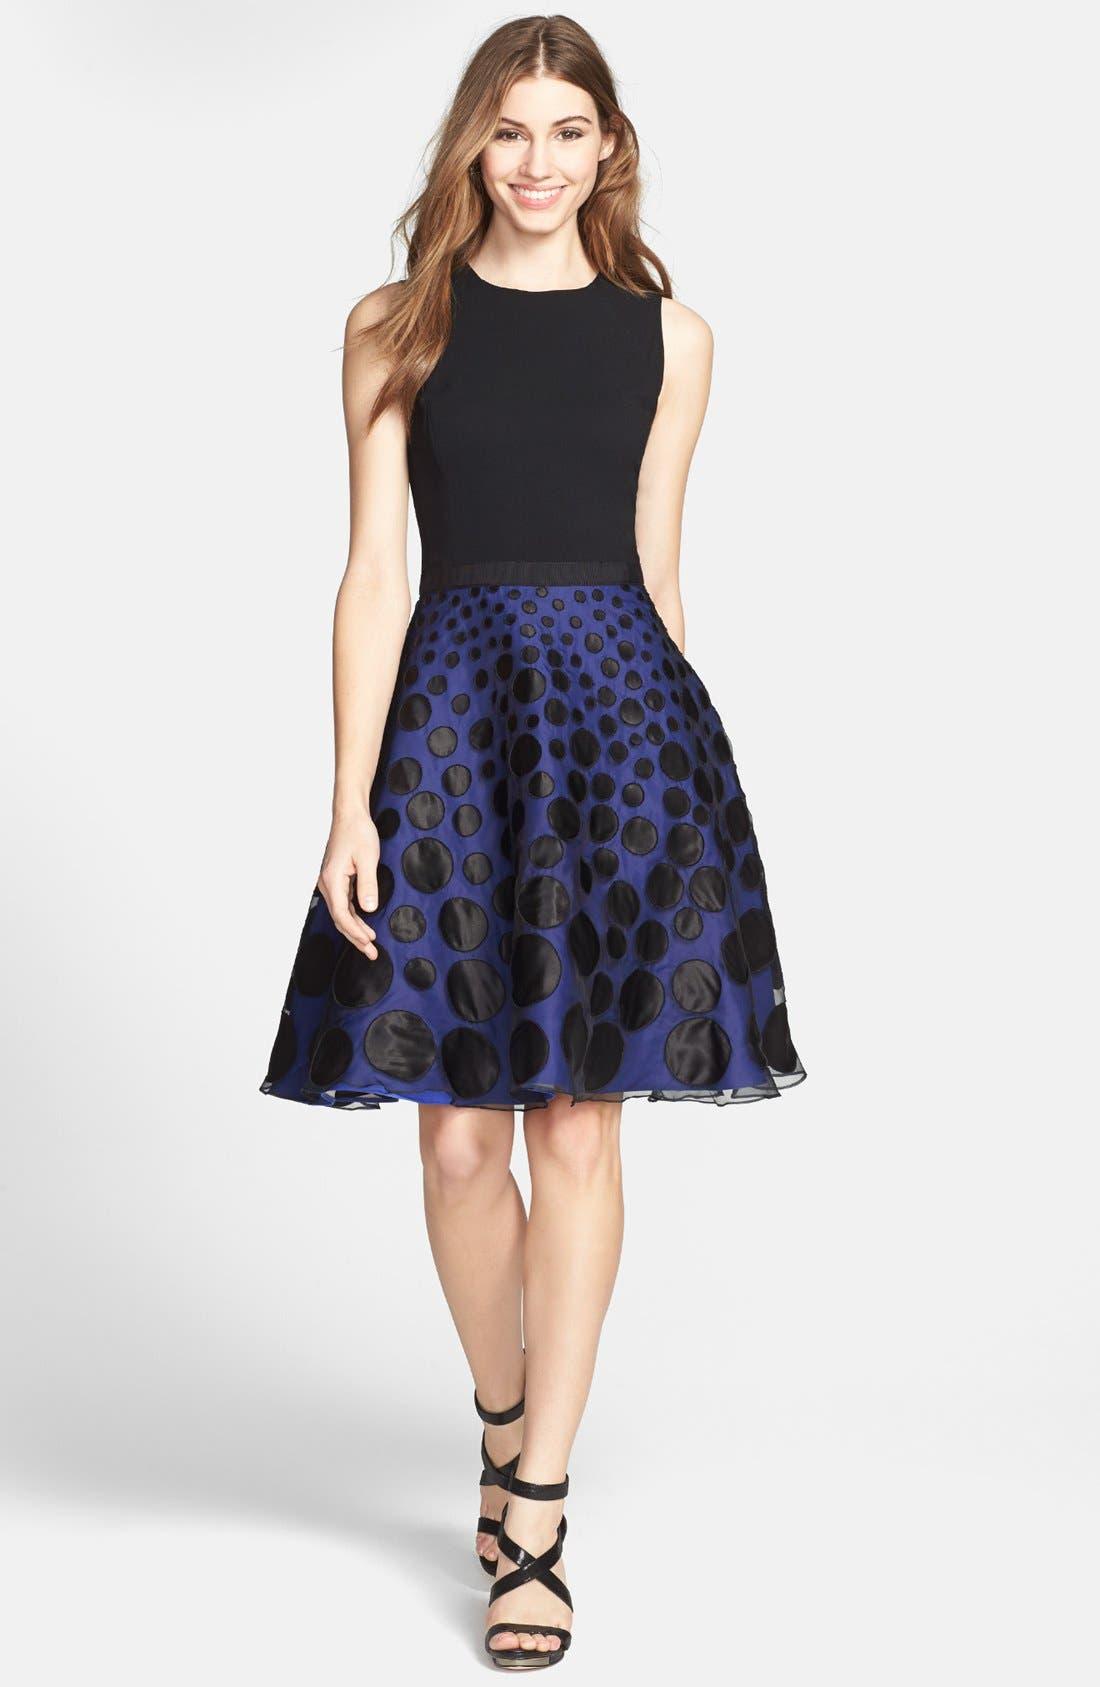 Alternate Image 1 Selected - Halston Heritage Mixed Media Fit & Flare Dress